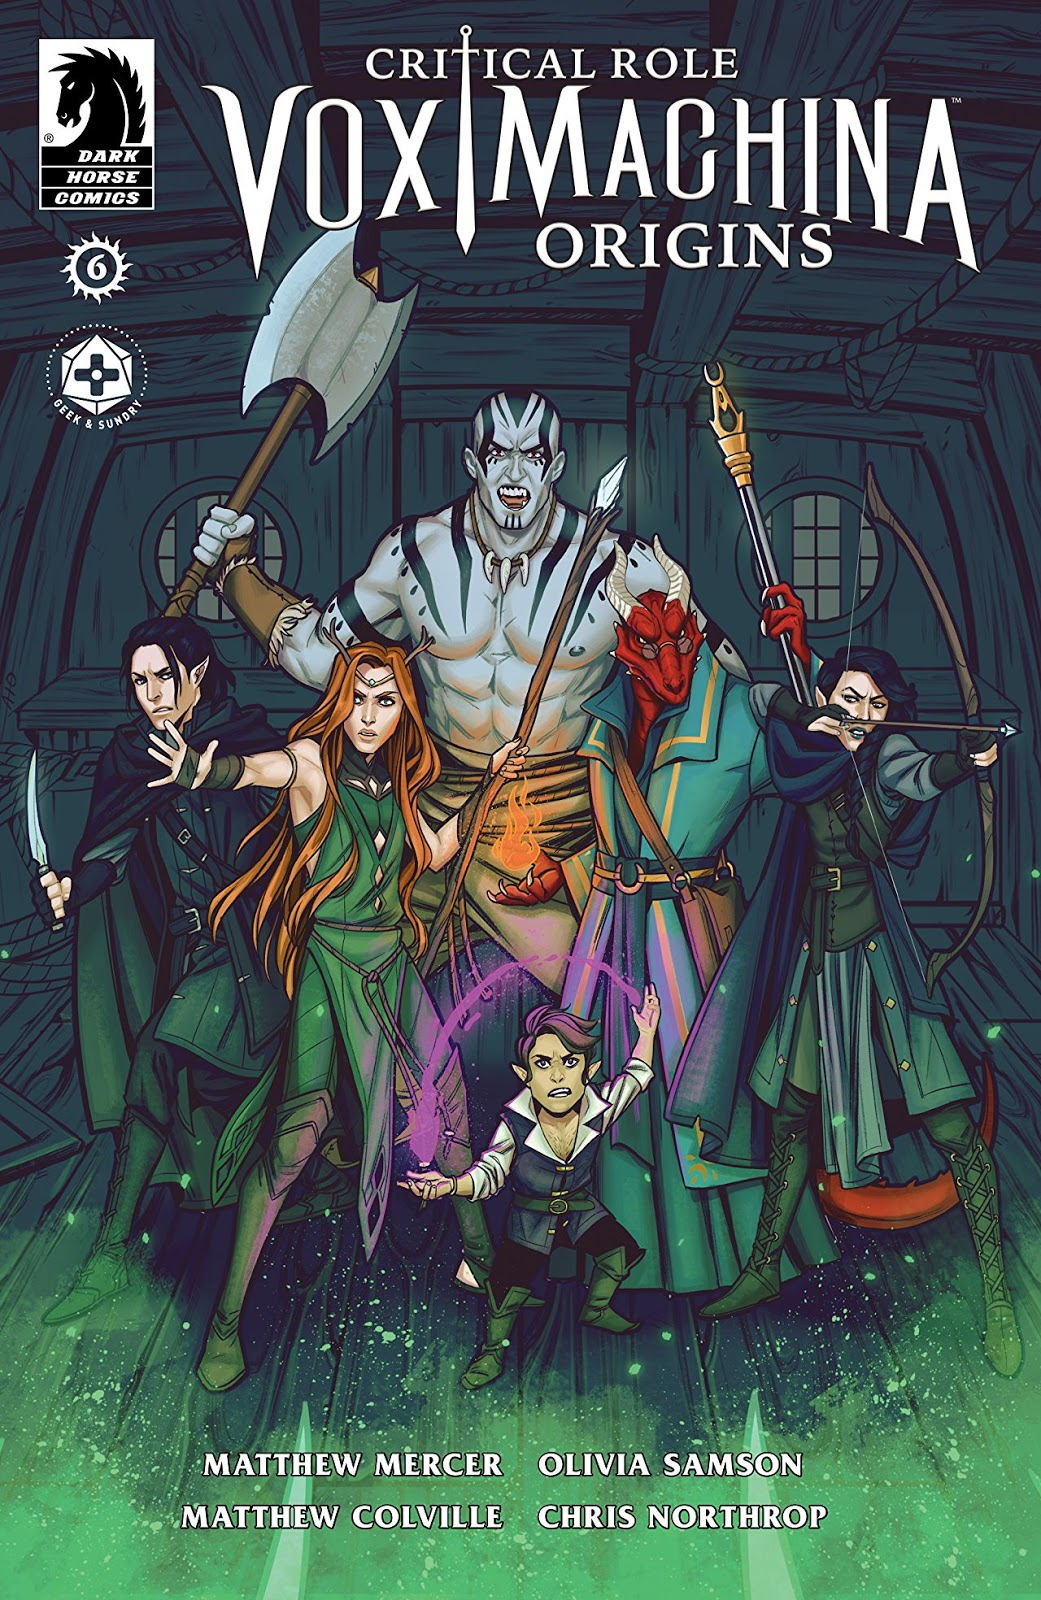 Action Comics 1000 2018 Webrip The Last Kryptonian Dcp Cbr 116 9 Mb